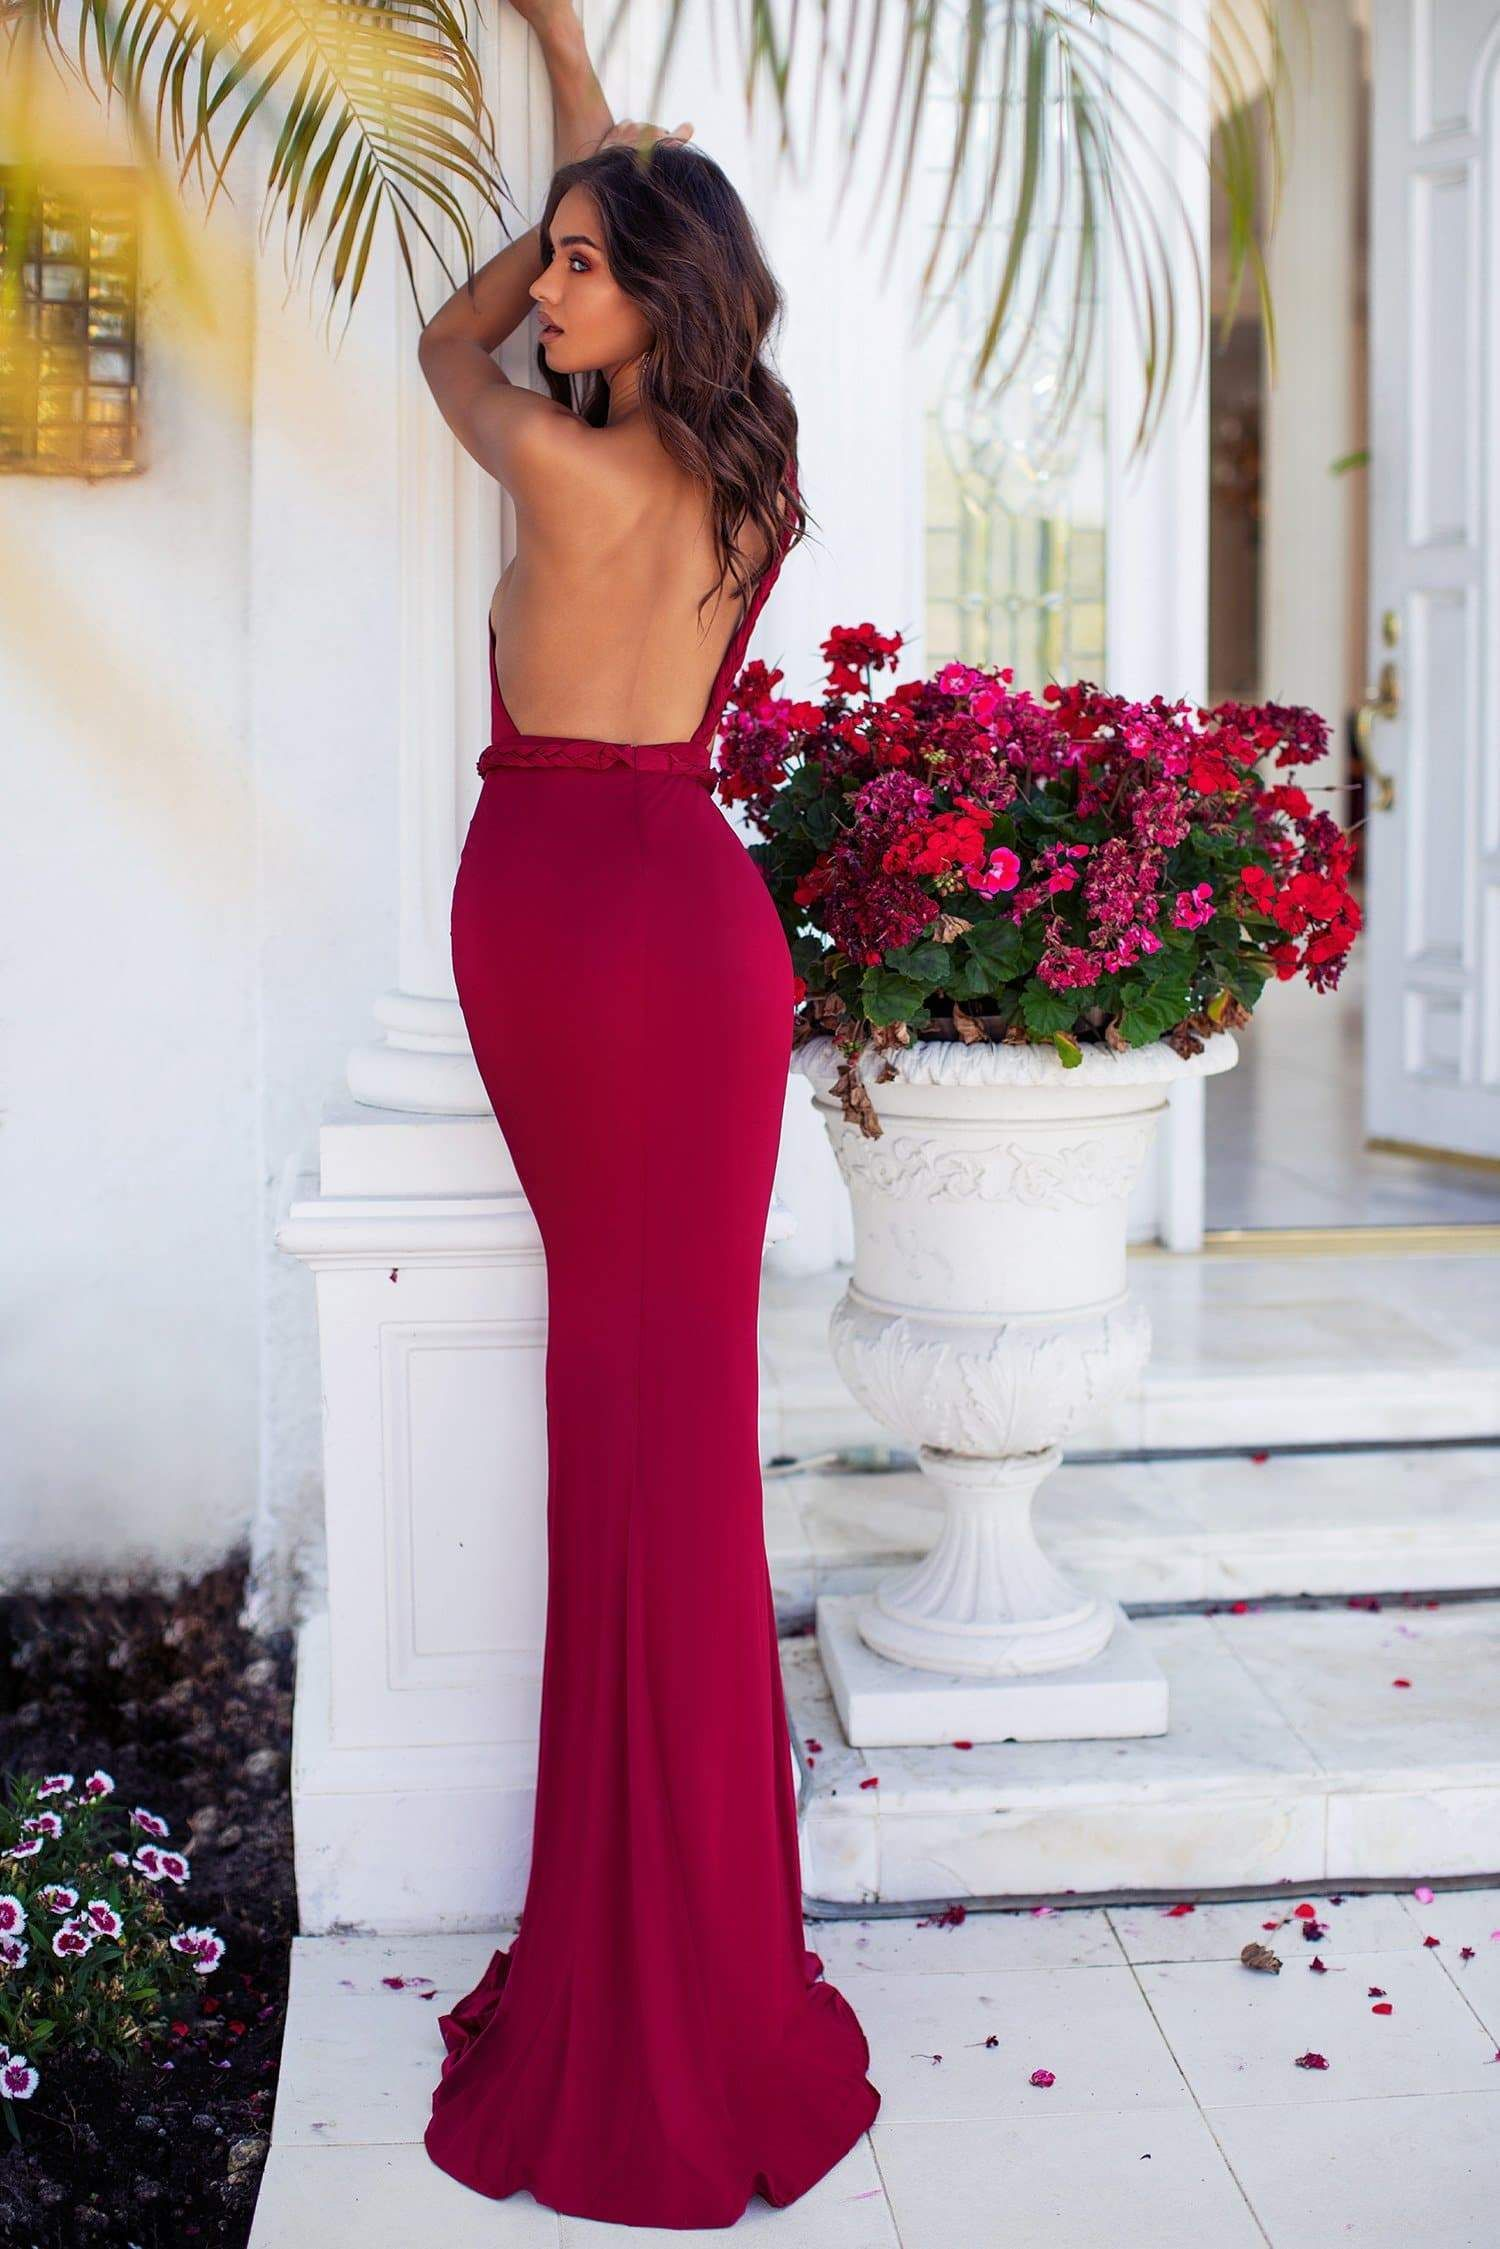 Graciela Wine Red Event Dresses Dresses Formal Dresses Prom [ 2249 x 1500 Pixel ]